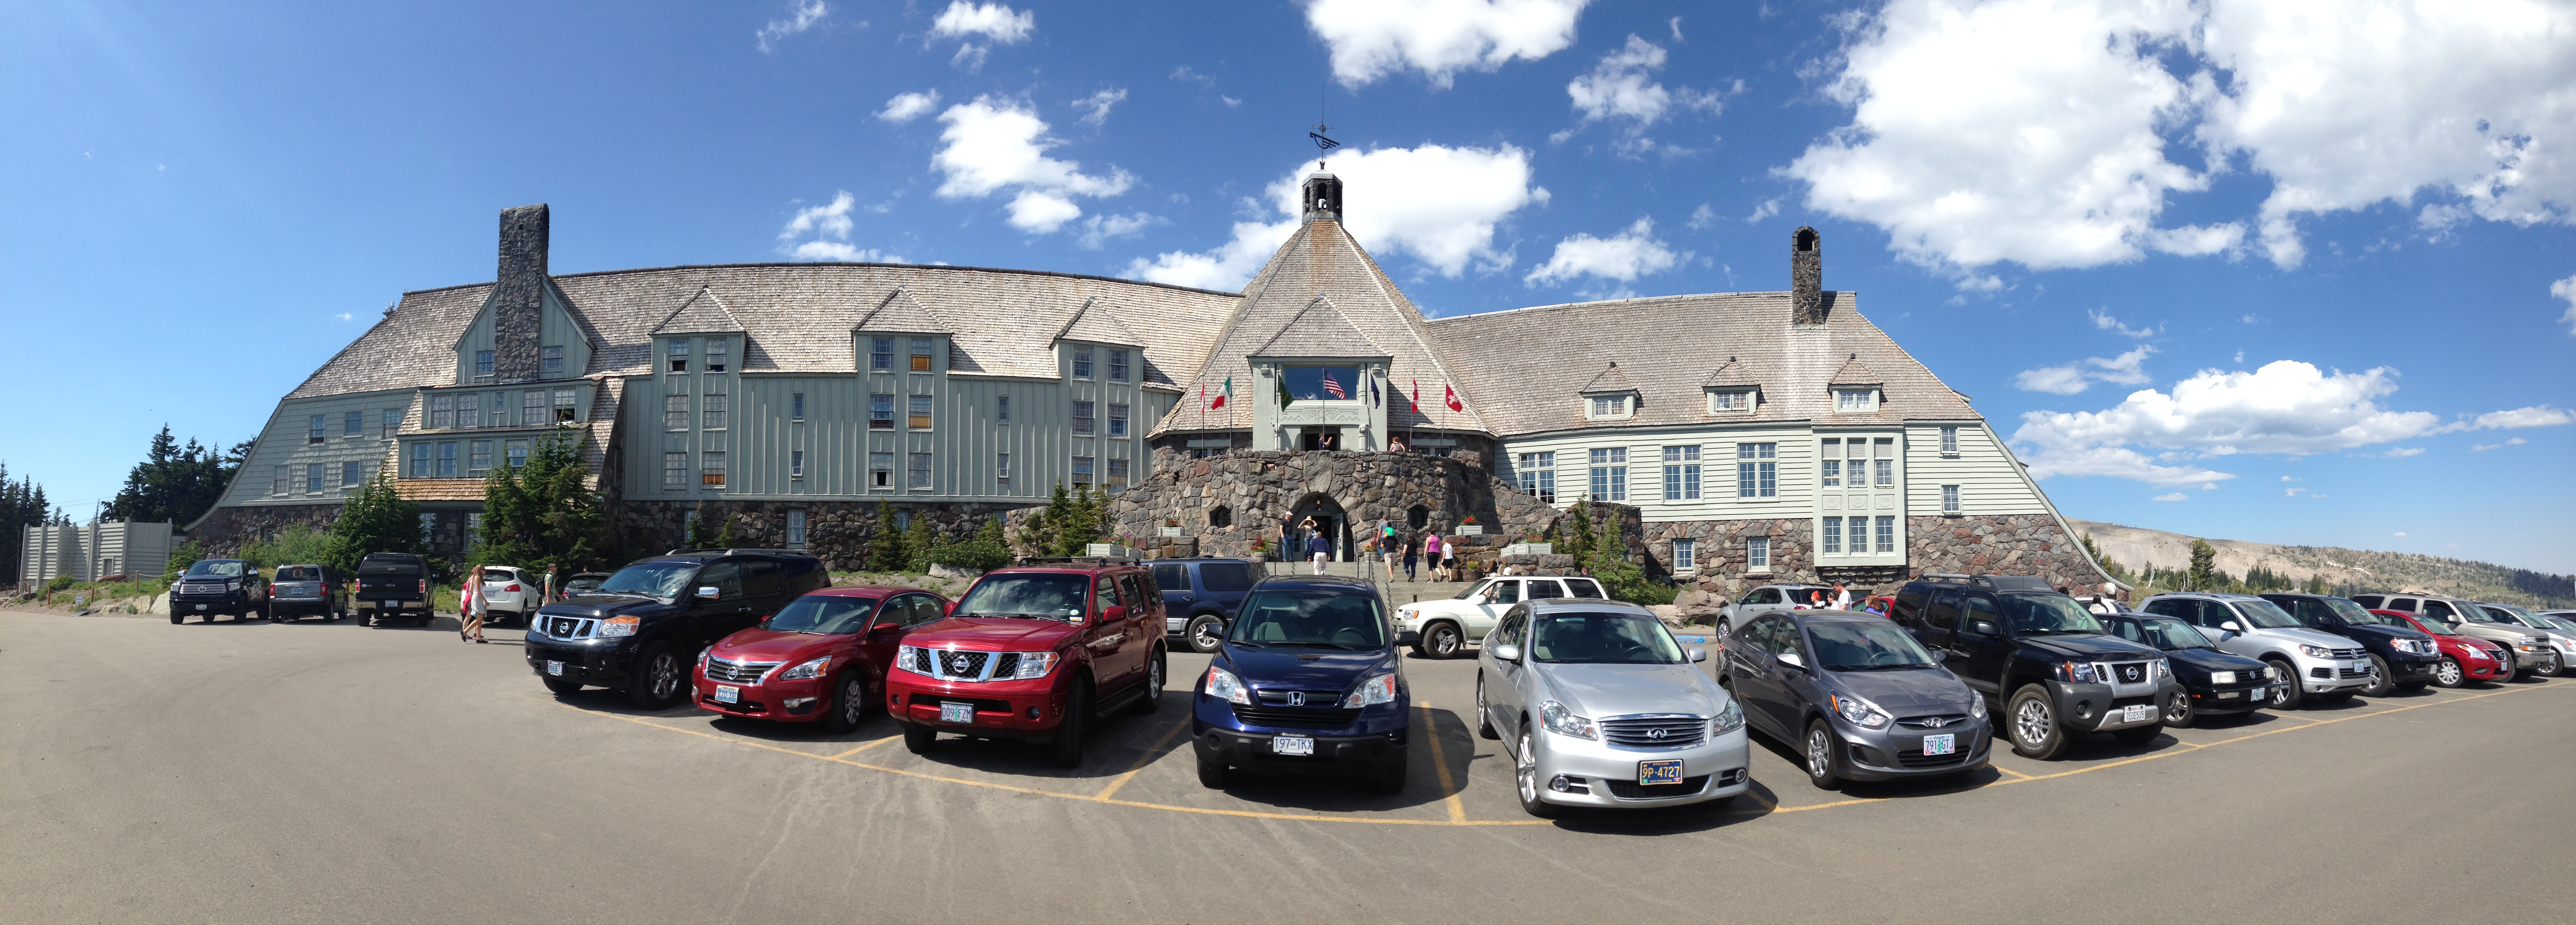 Timberline Lodge - Wikipedia